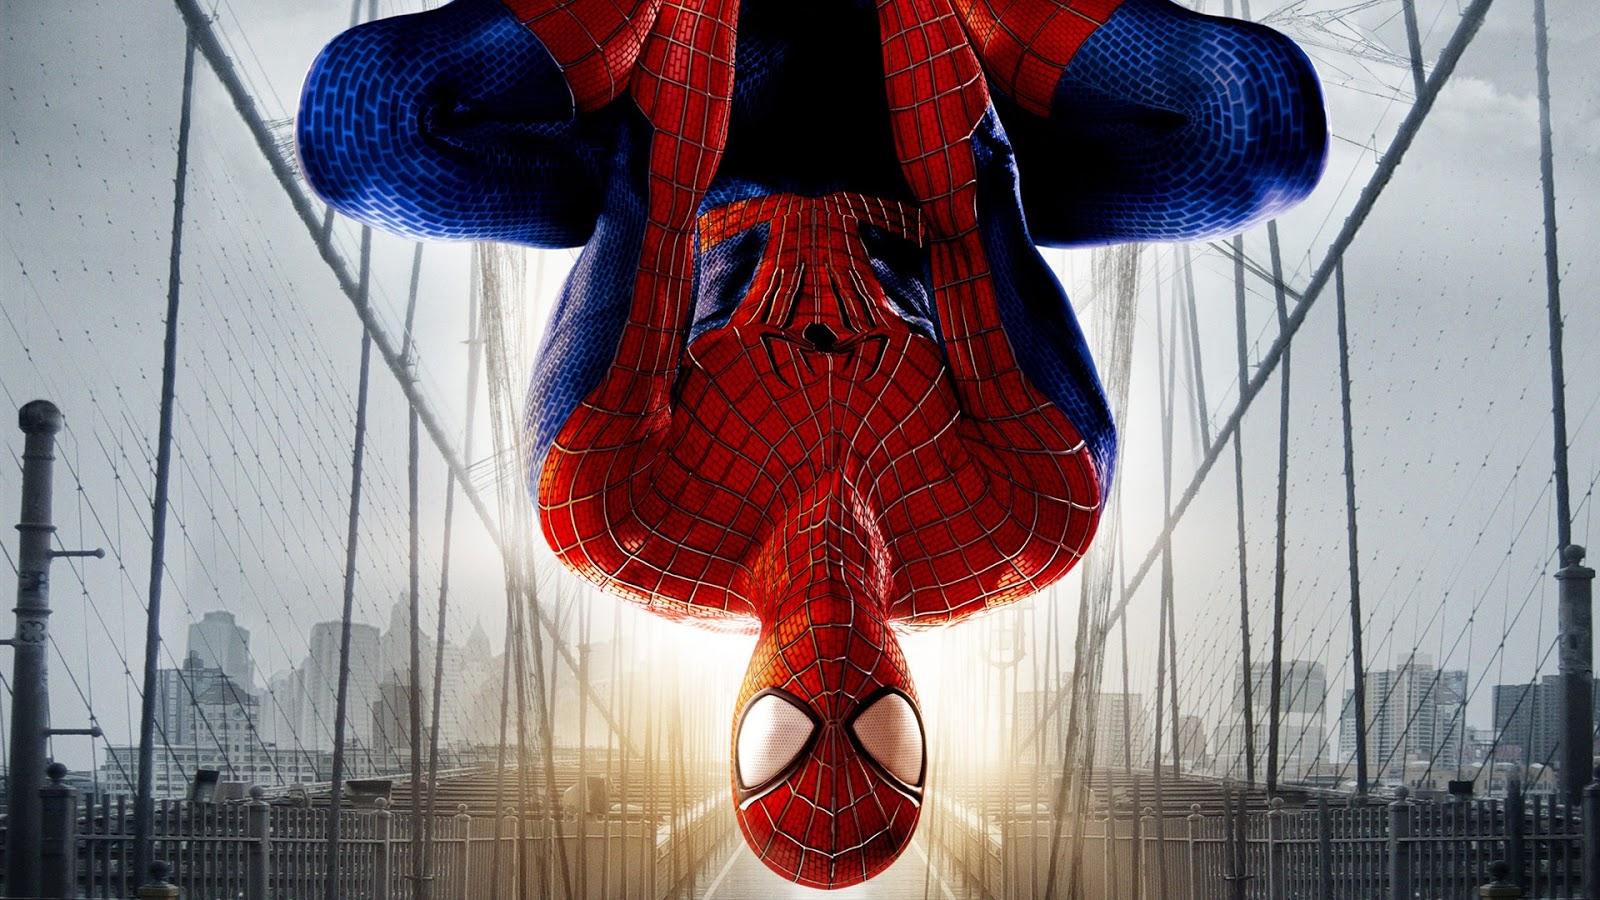 Amazing Spiderman 2 HD Wallpapers [1920x1080]   Walls720 1600x900